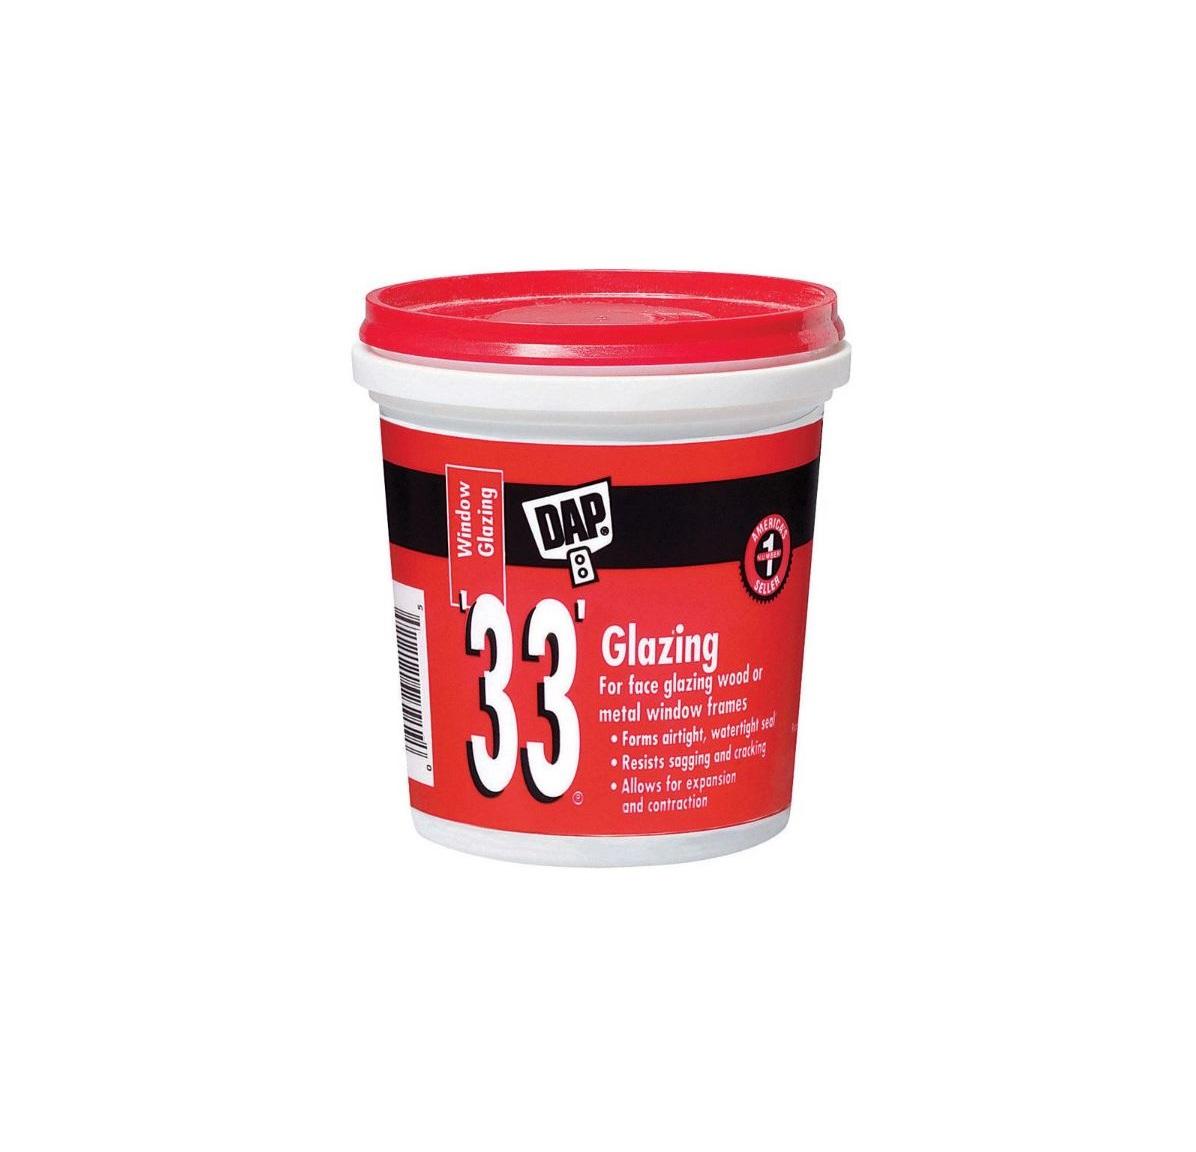 Dap 33 Glazing Compound White 1 2pt Warren Pipe And Supply